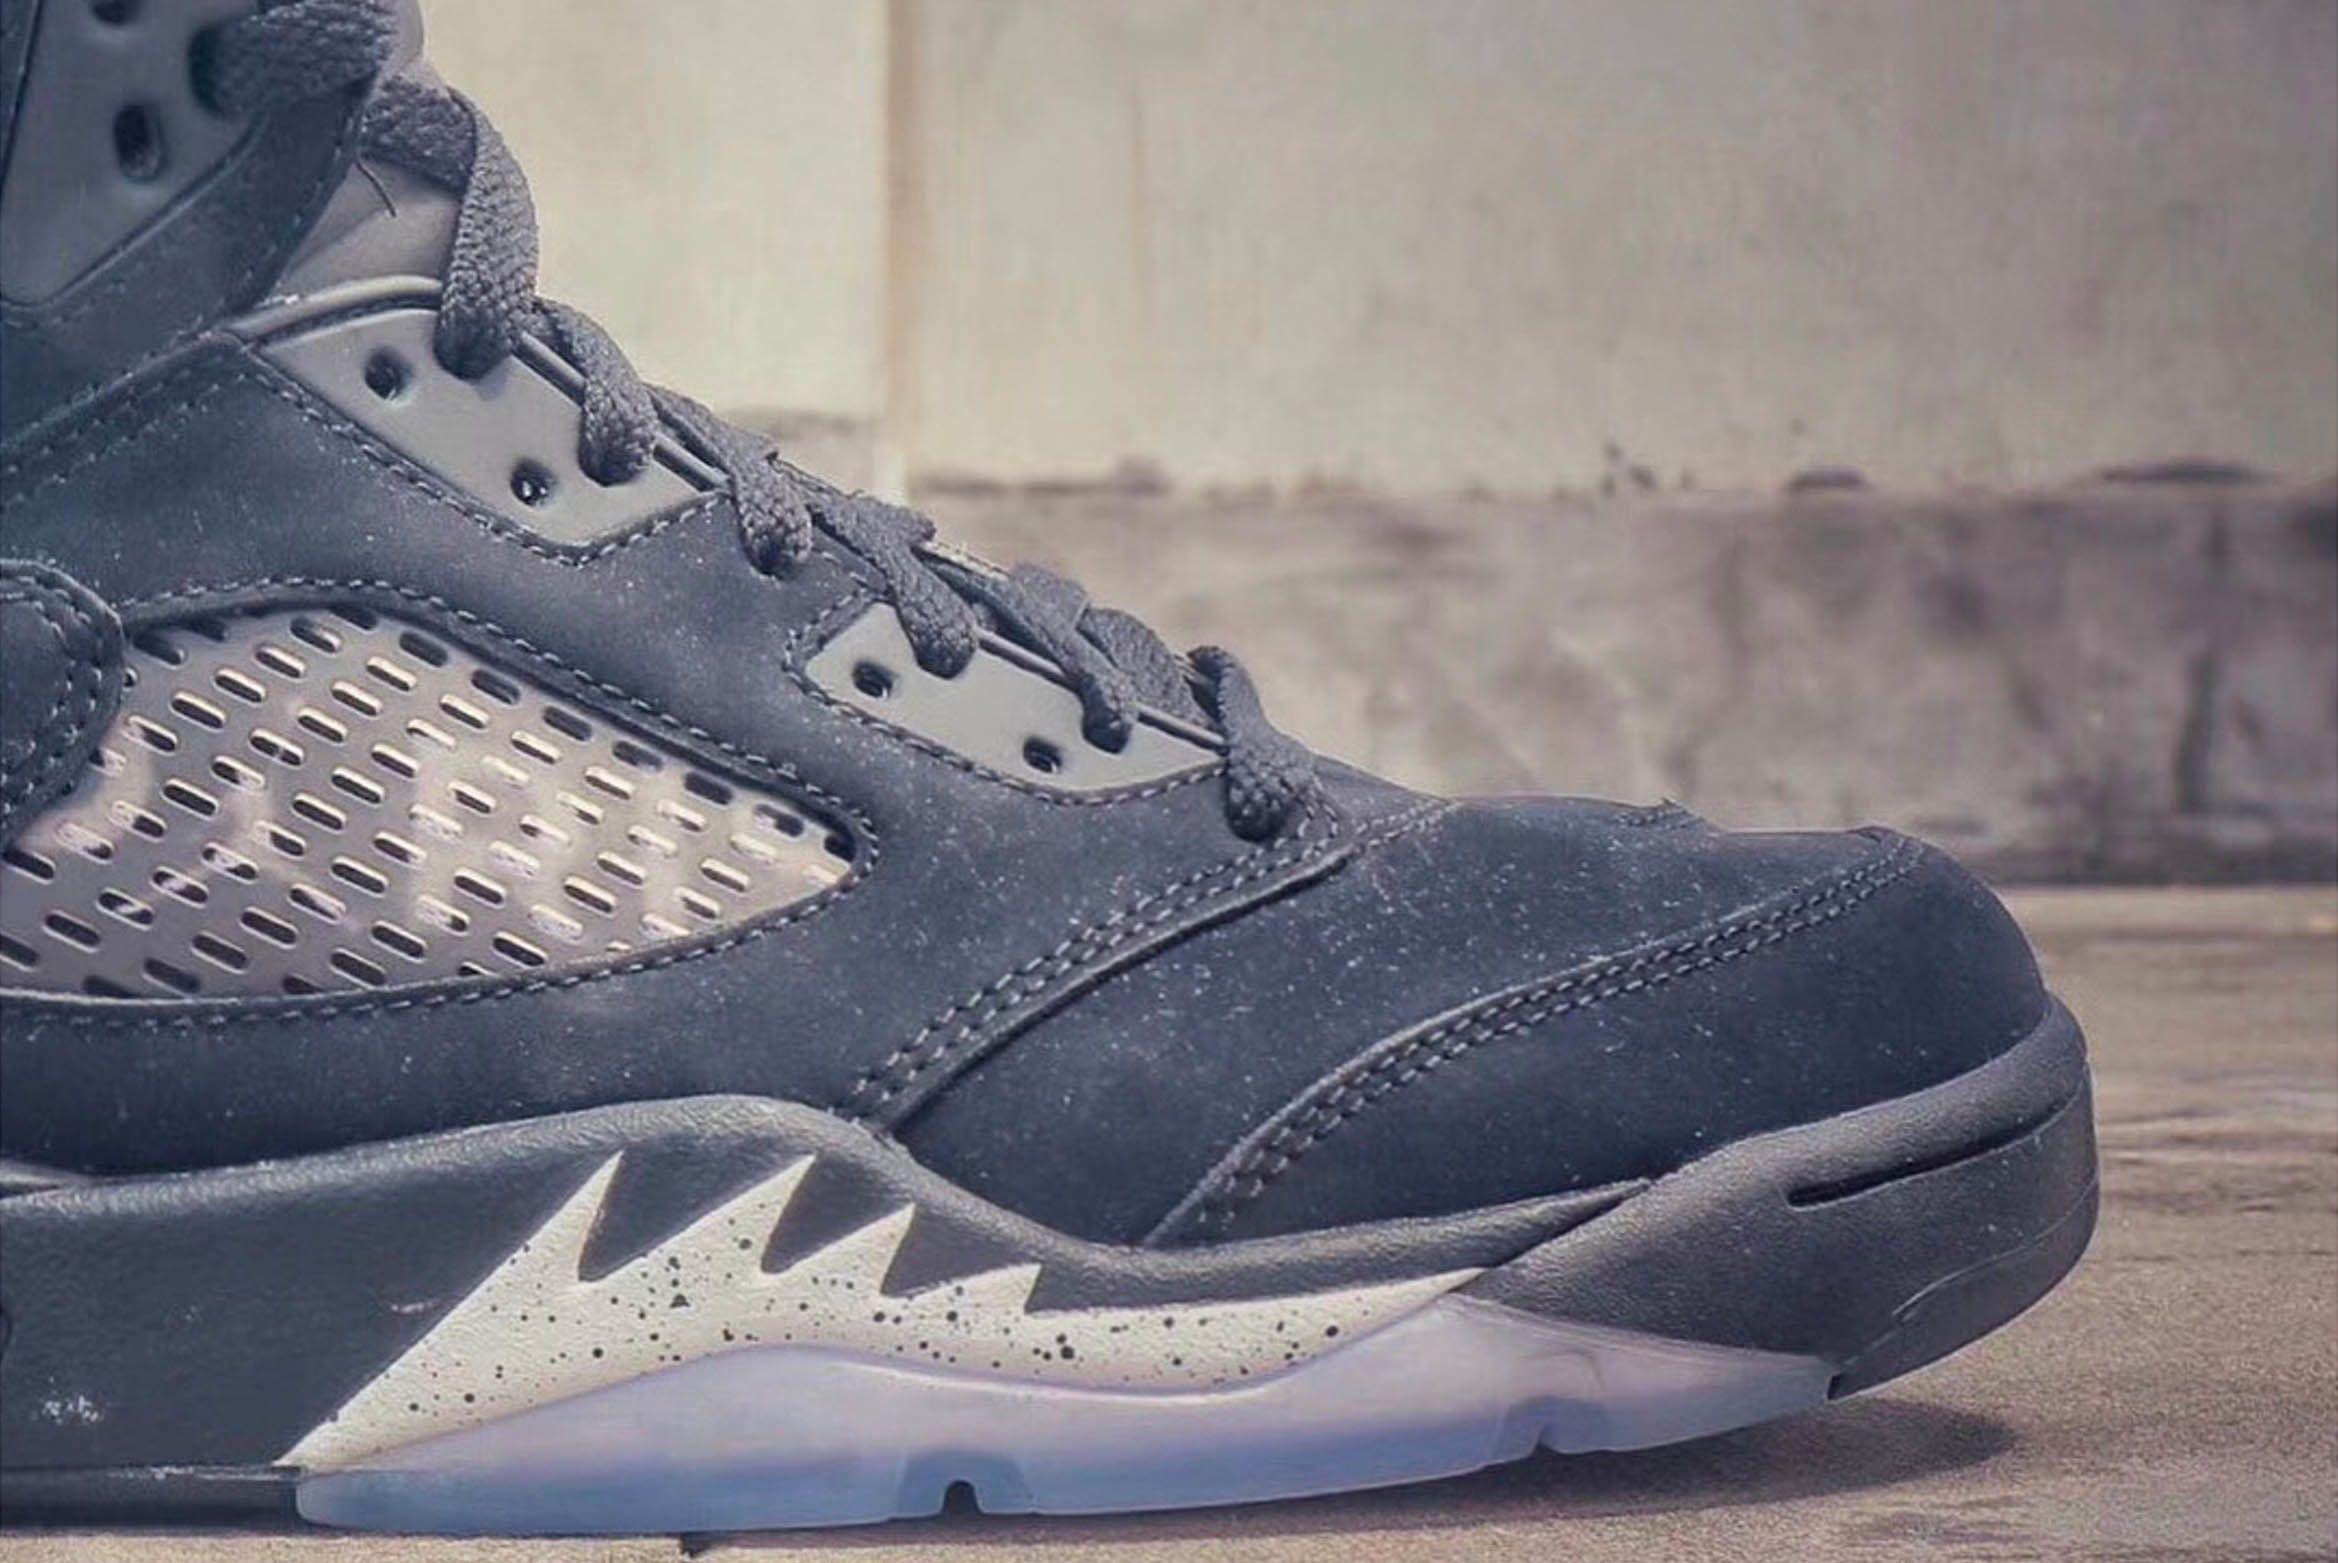 Air Jordan 5 Retro Paris Saint Germain First Look 2 Sneaker Freaker